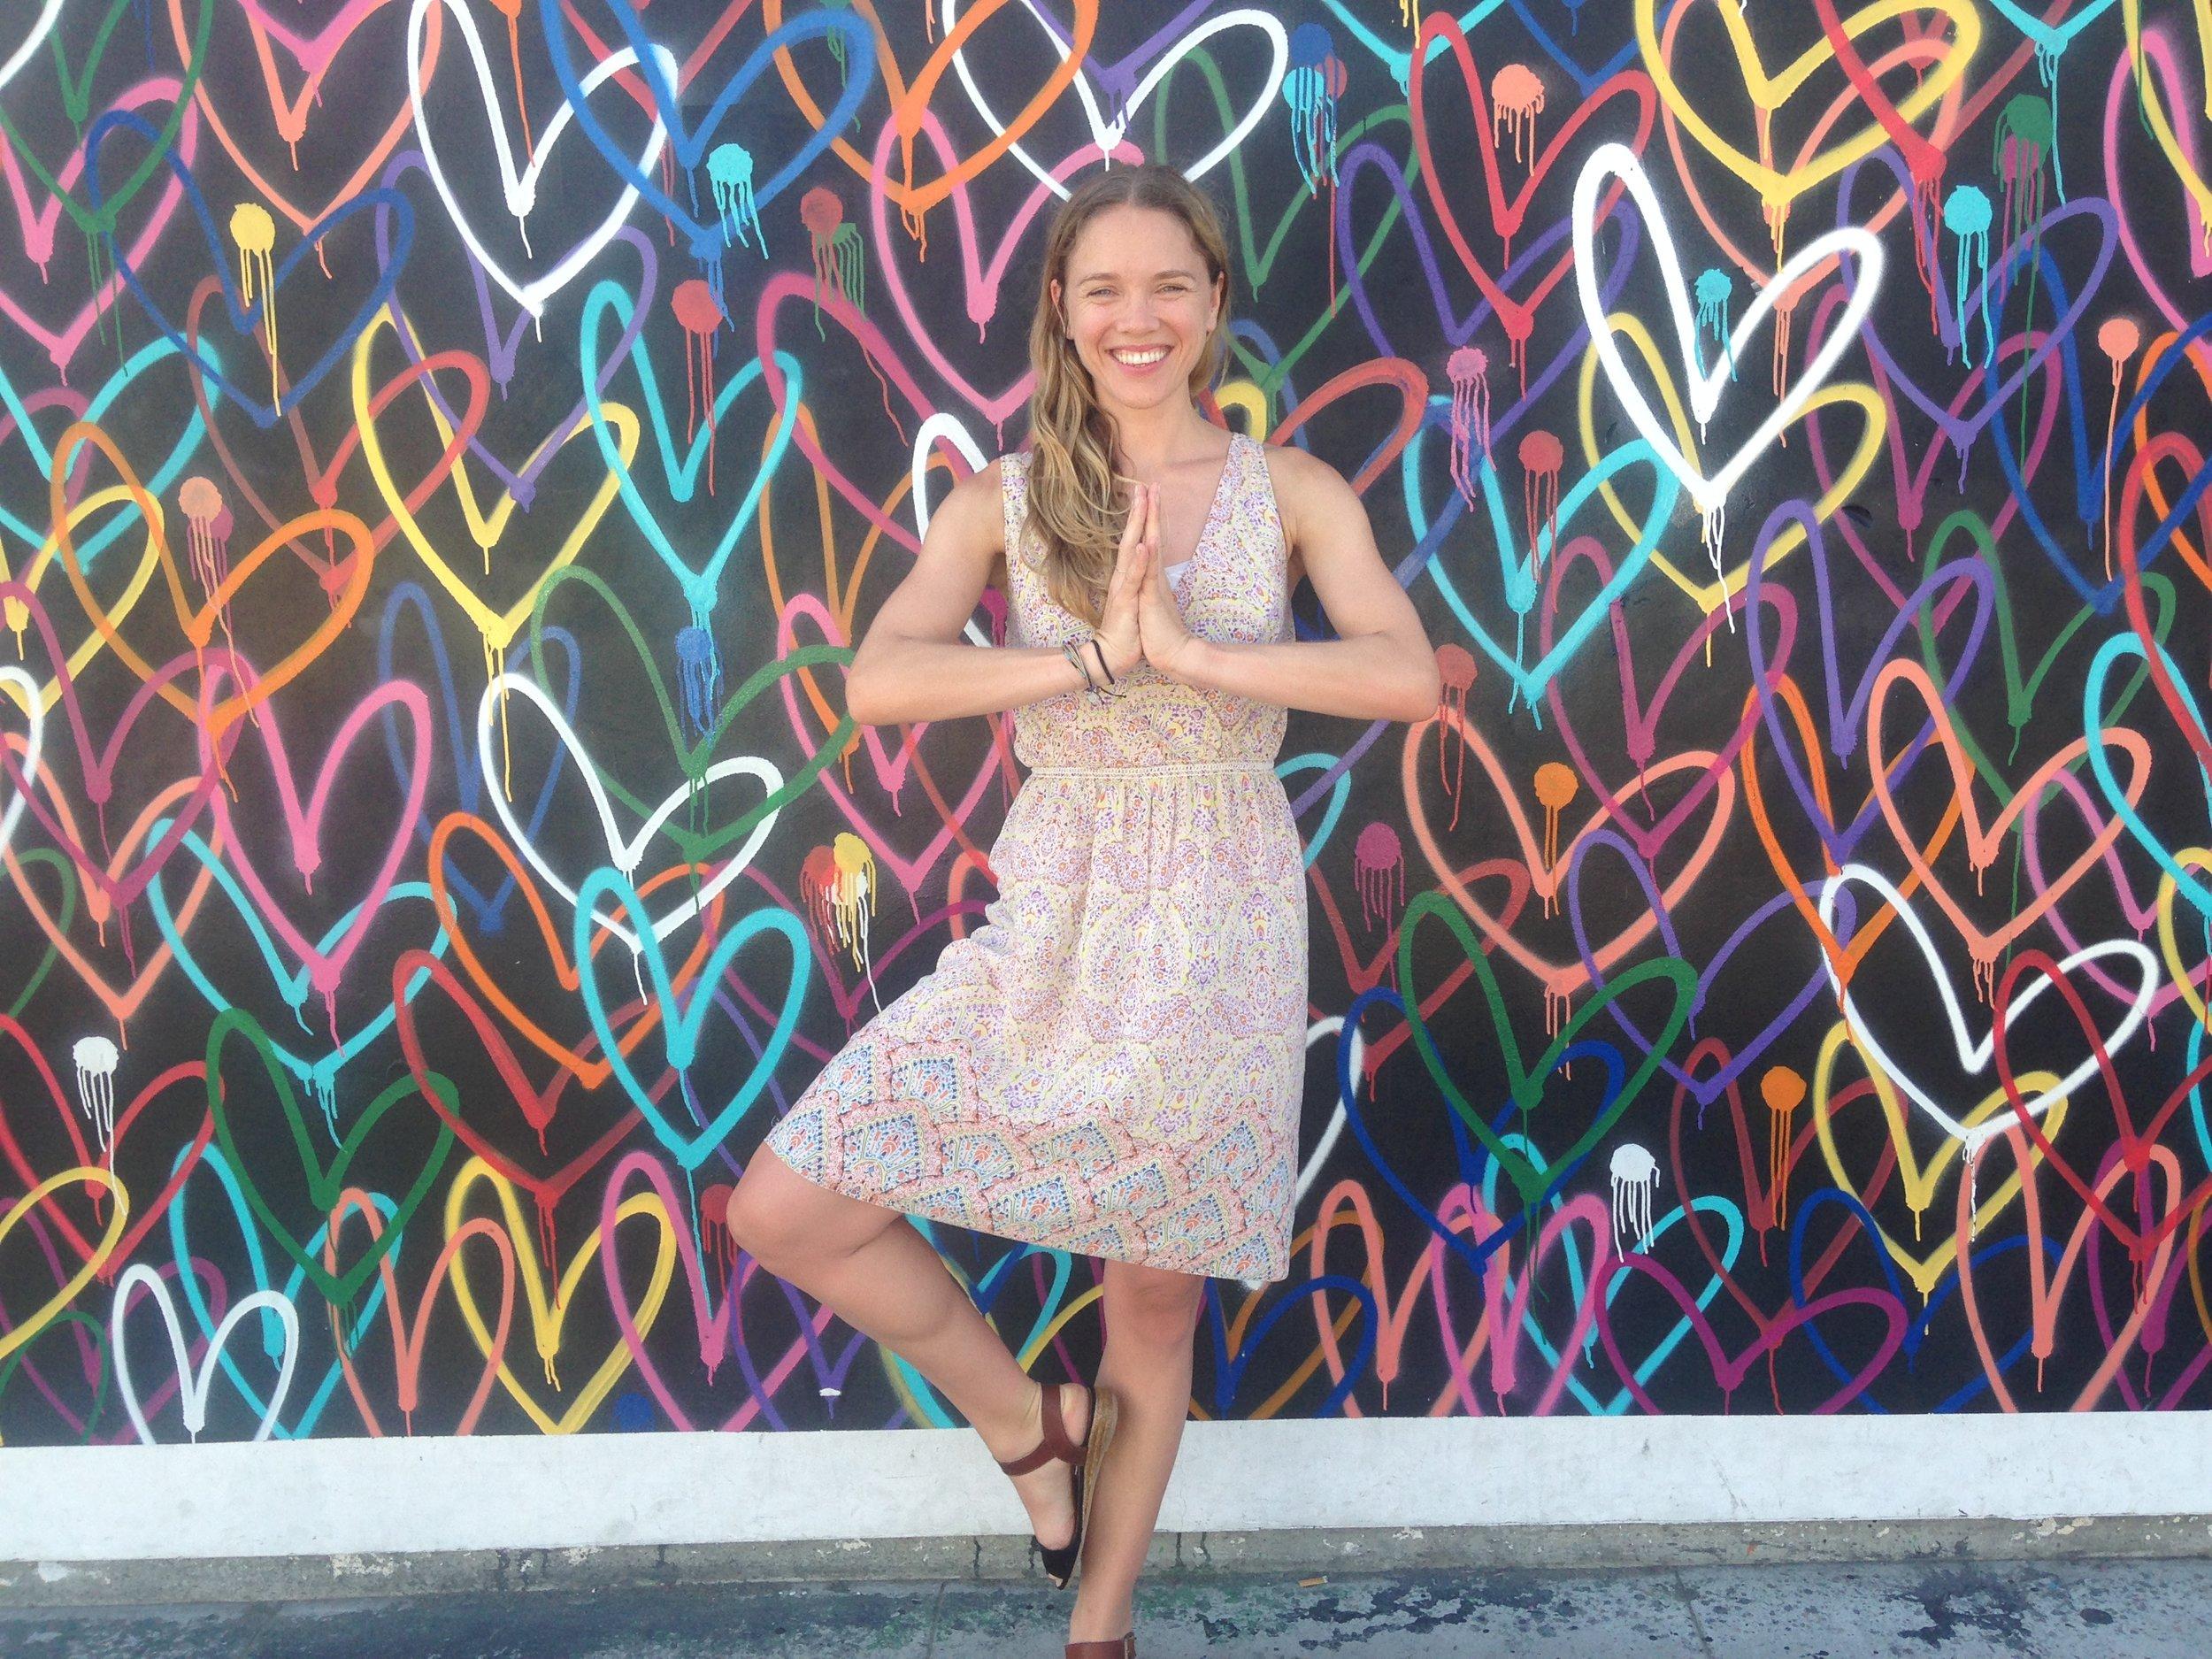 Love Wall in Venice Beach, California